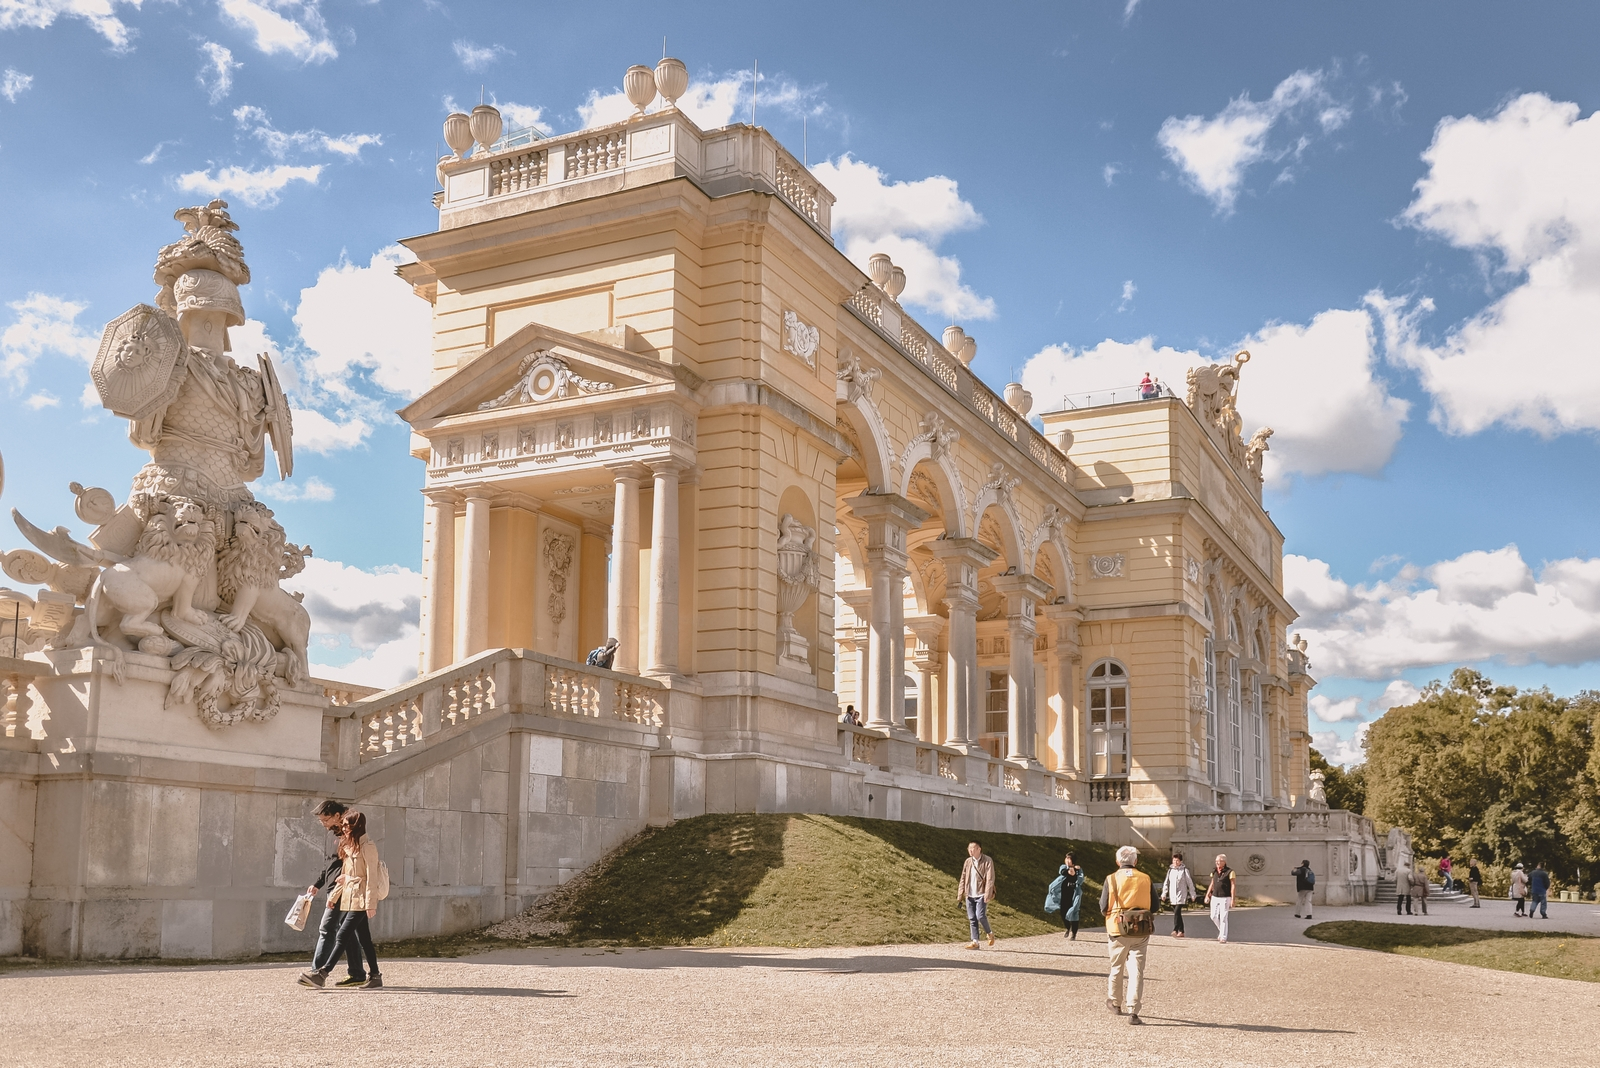 Gloriette, Schonbrunn Gardens - 10 best things to do in Vienna, Austria - from travel blog http:://Epepa.eu